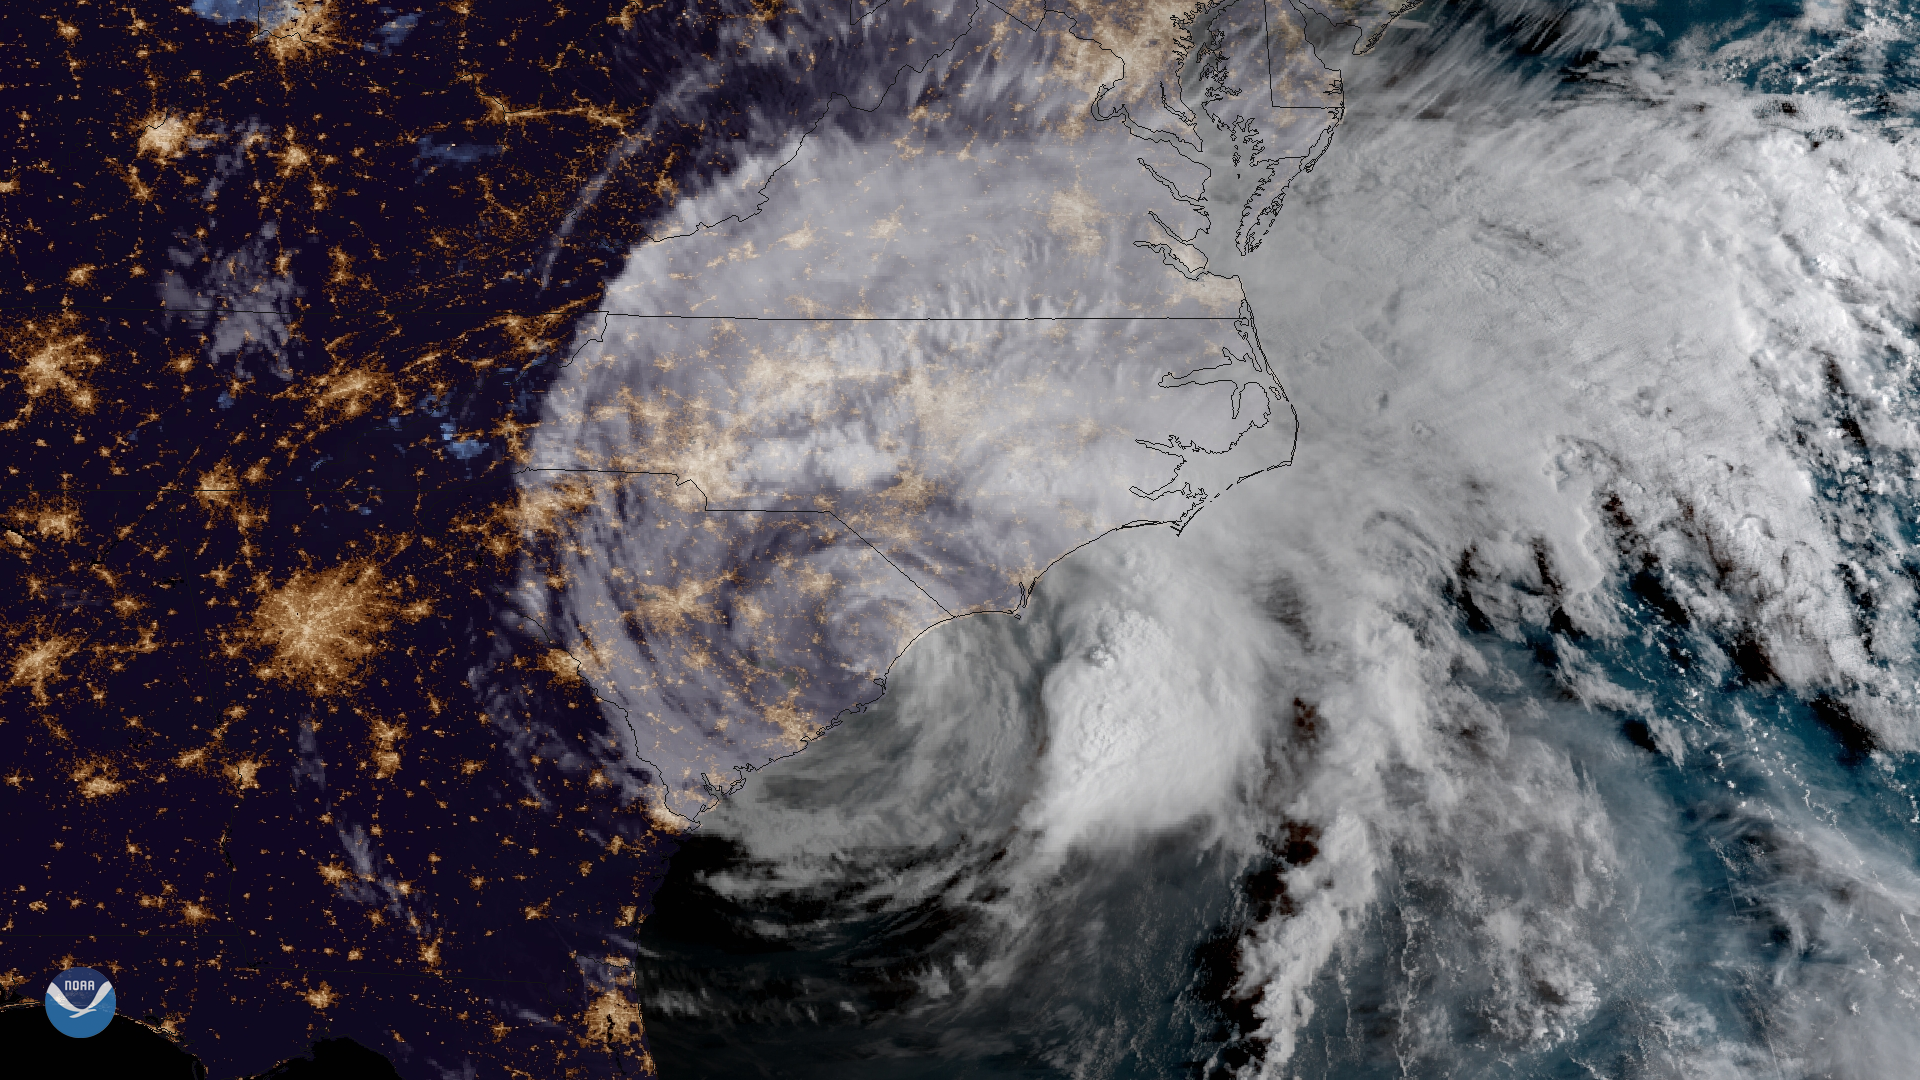 Image of Hurricane Florence approaching the Carolina coast. NOAA / noaa.gov and the NOAA Environmental Visualization Laboratory